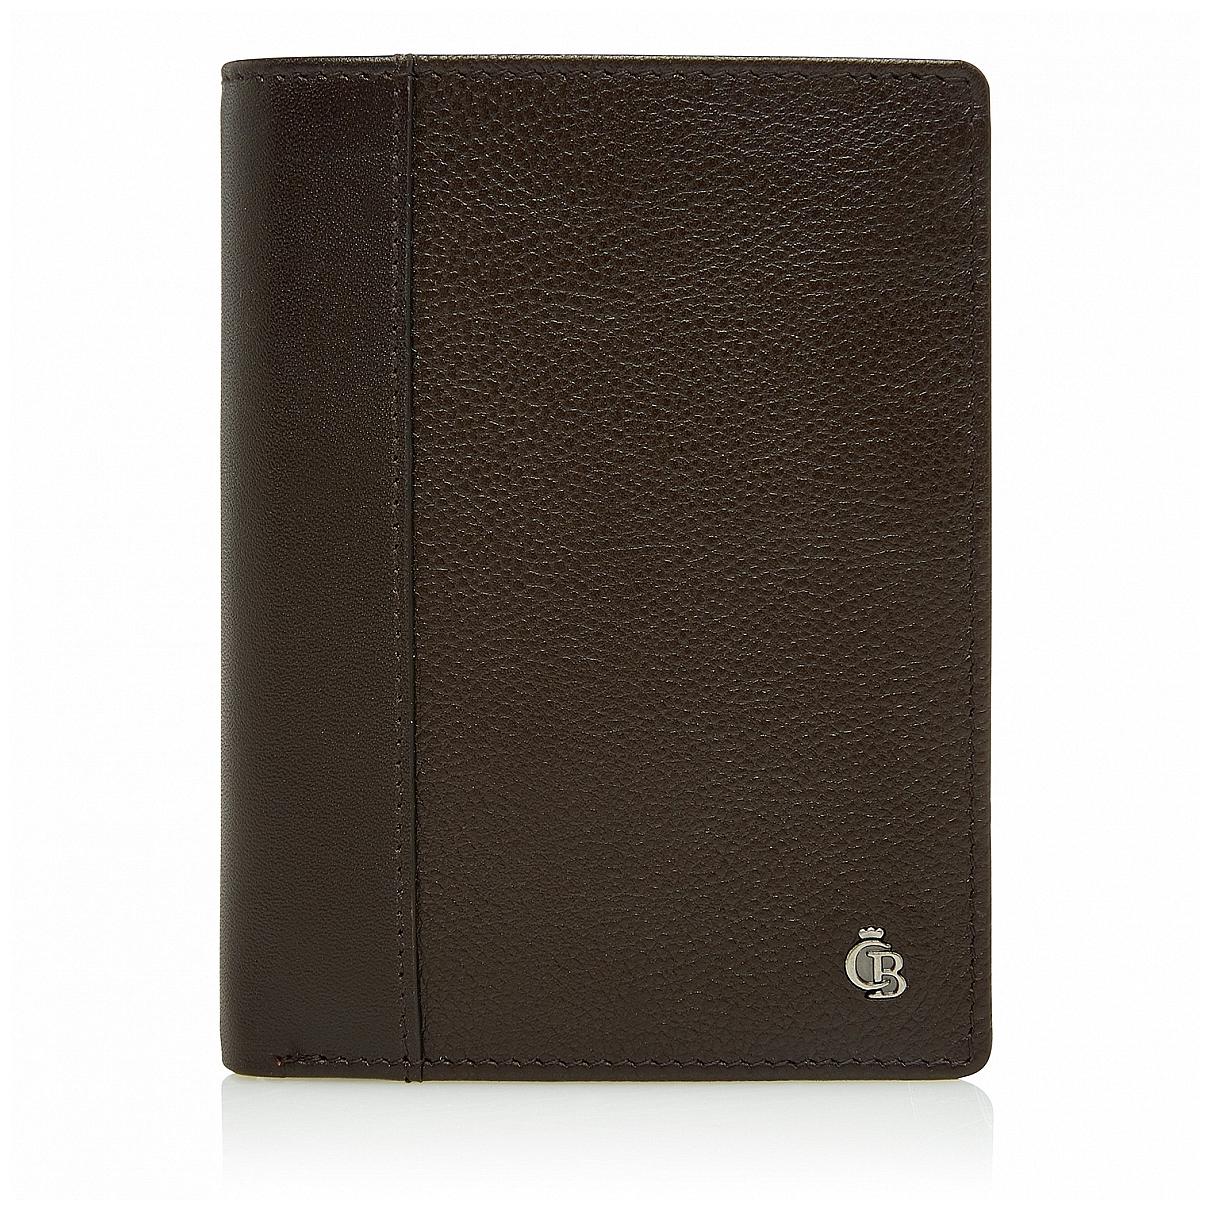 Castelijn & Beerens Pánská kožená peněženka RFID 695793 VIVO hnědá